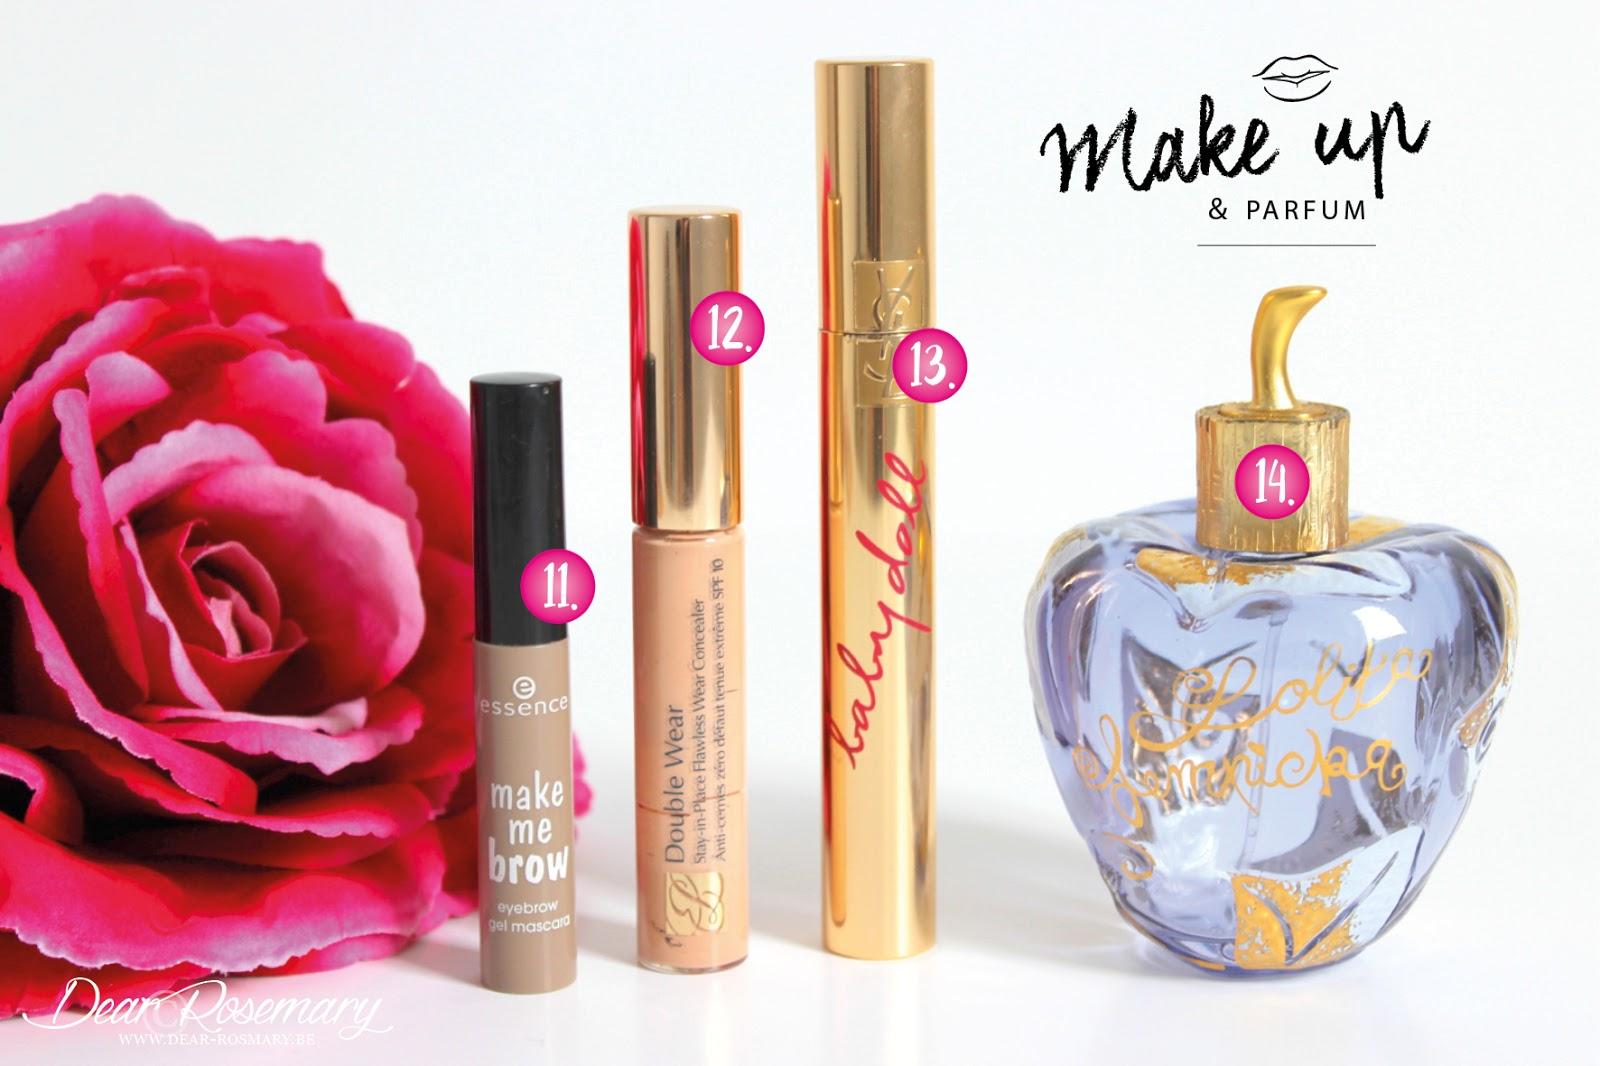 Mascara essence rose prix